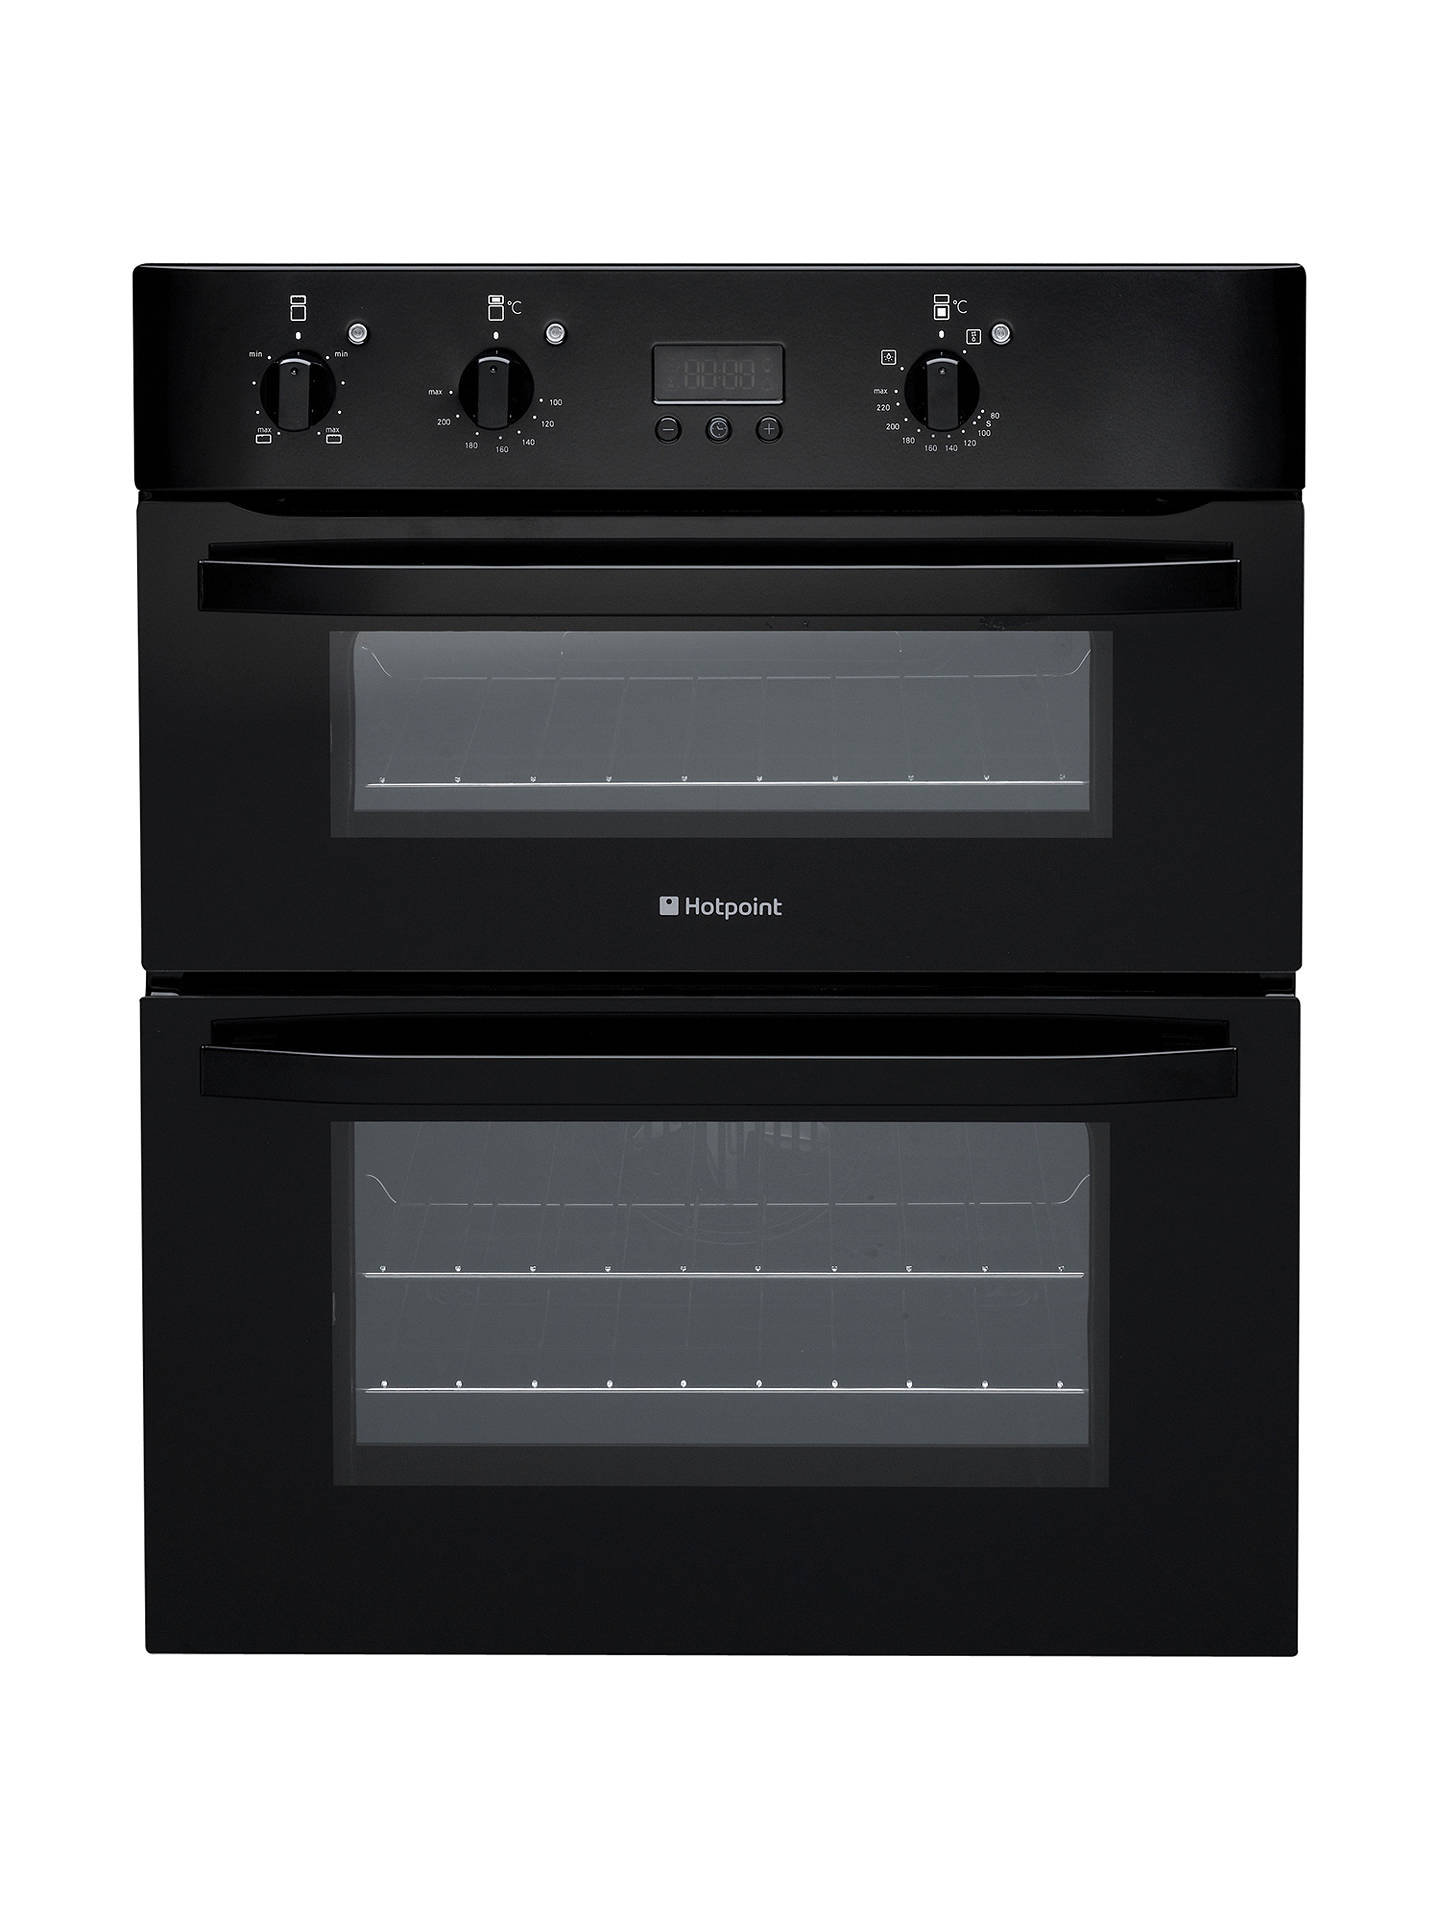 hotpoint uh53ks double electric oven black at john lewis. Black Bedroom Furniture Sets. Home Design Ideas